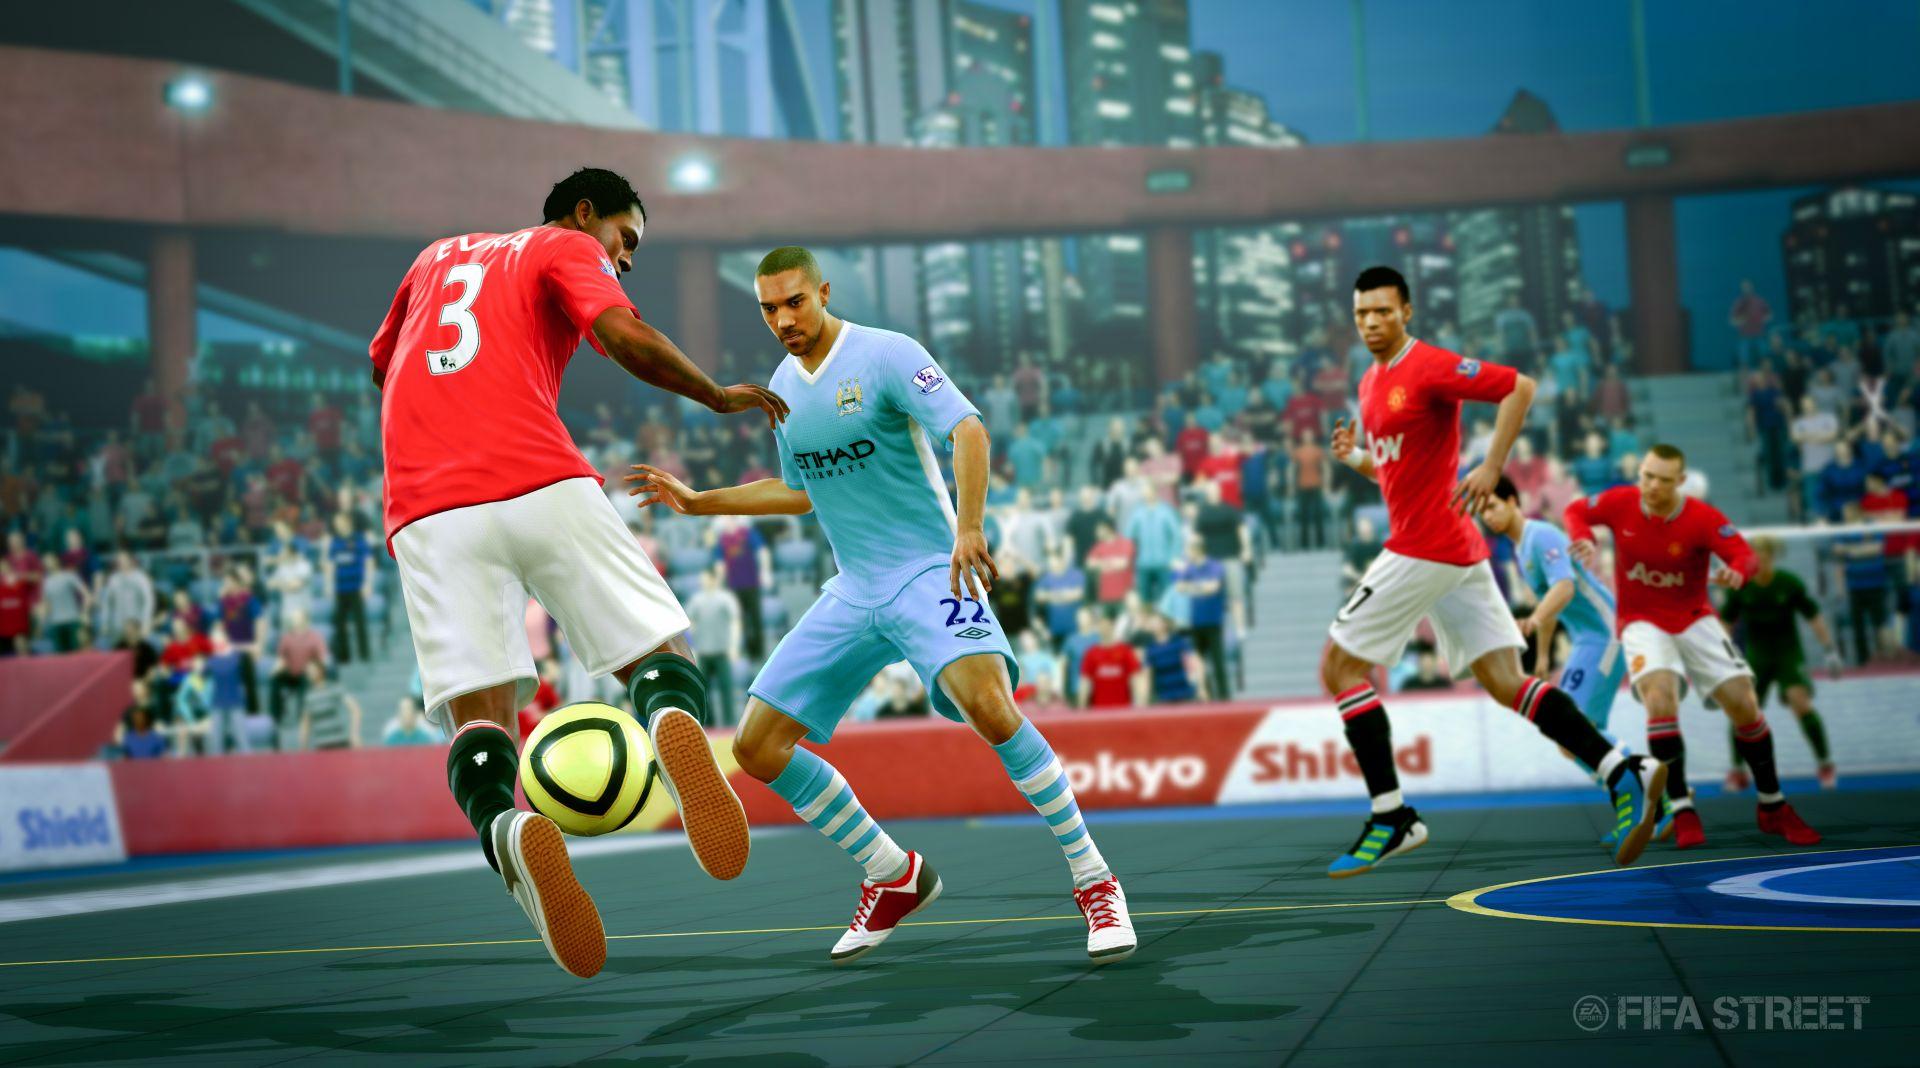 Screenshoty z FIFA Street 54265